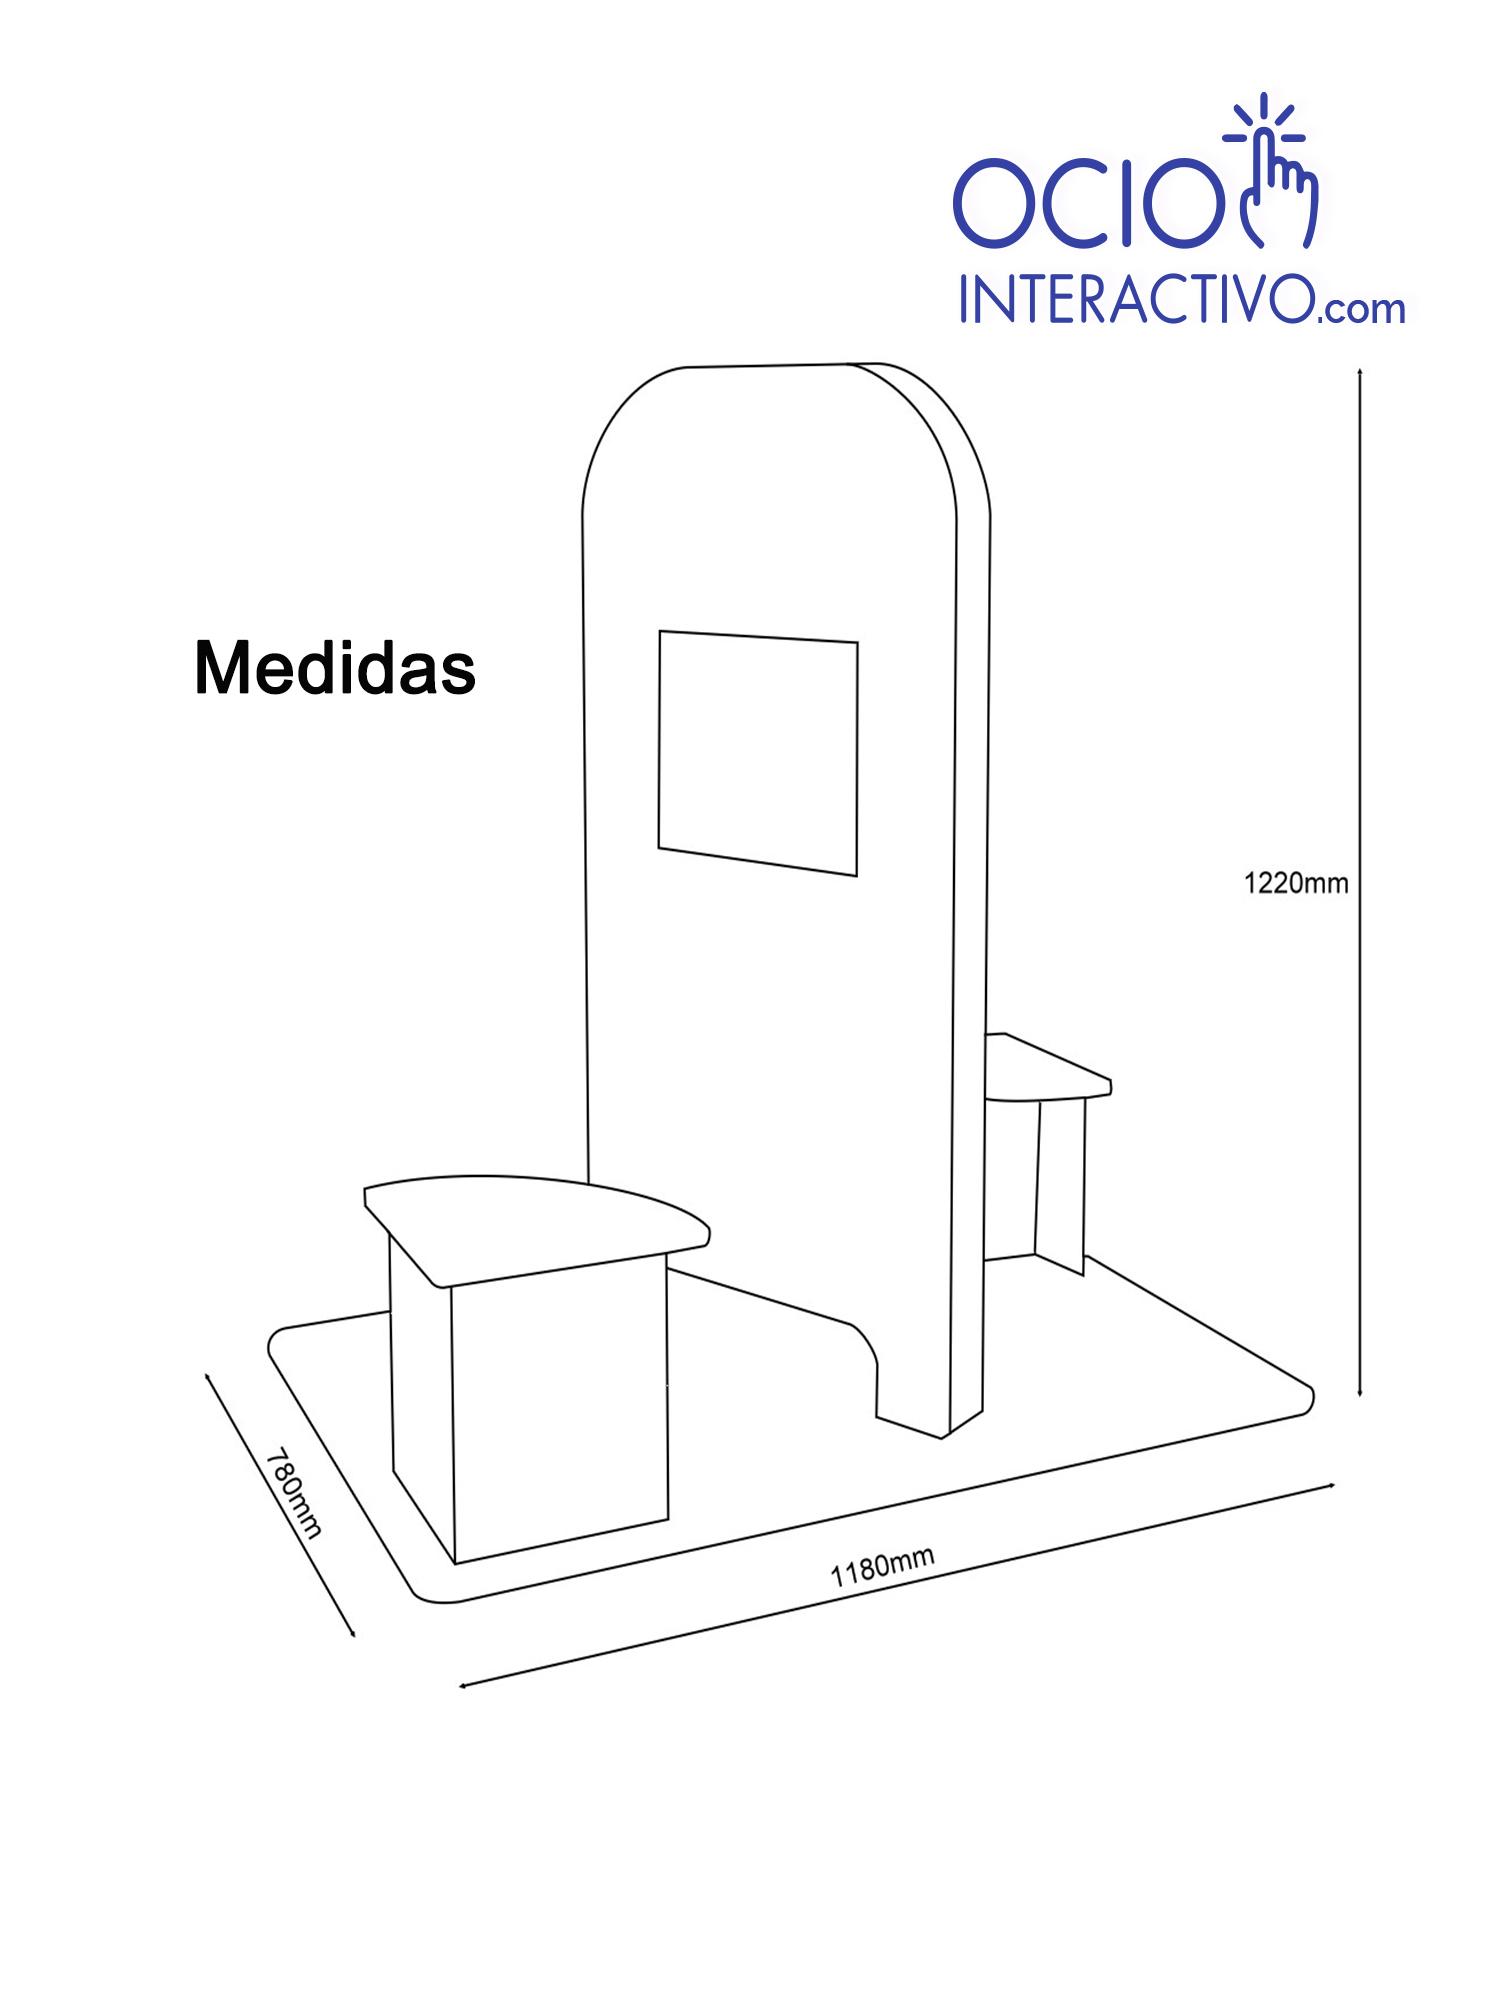 https://parquedebolas.com/images/productos/peq/kids%20corner%20medidas%20asiento%20doble.jpg